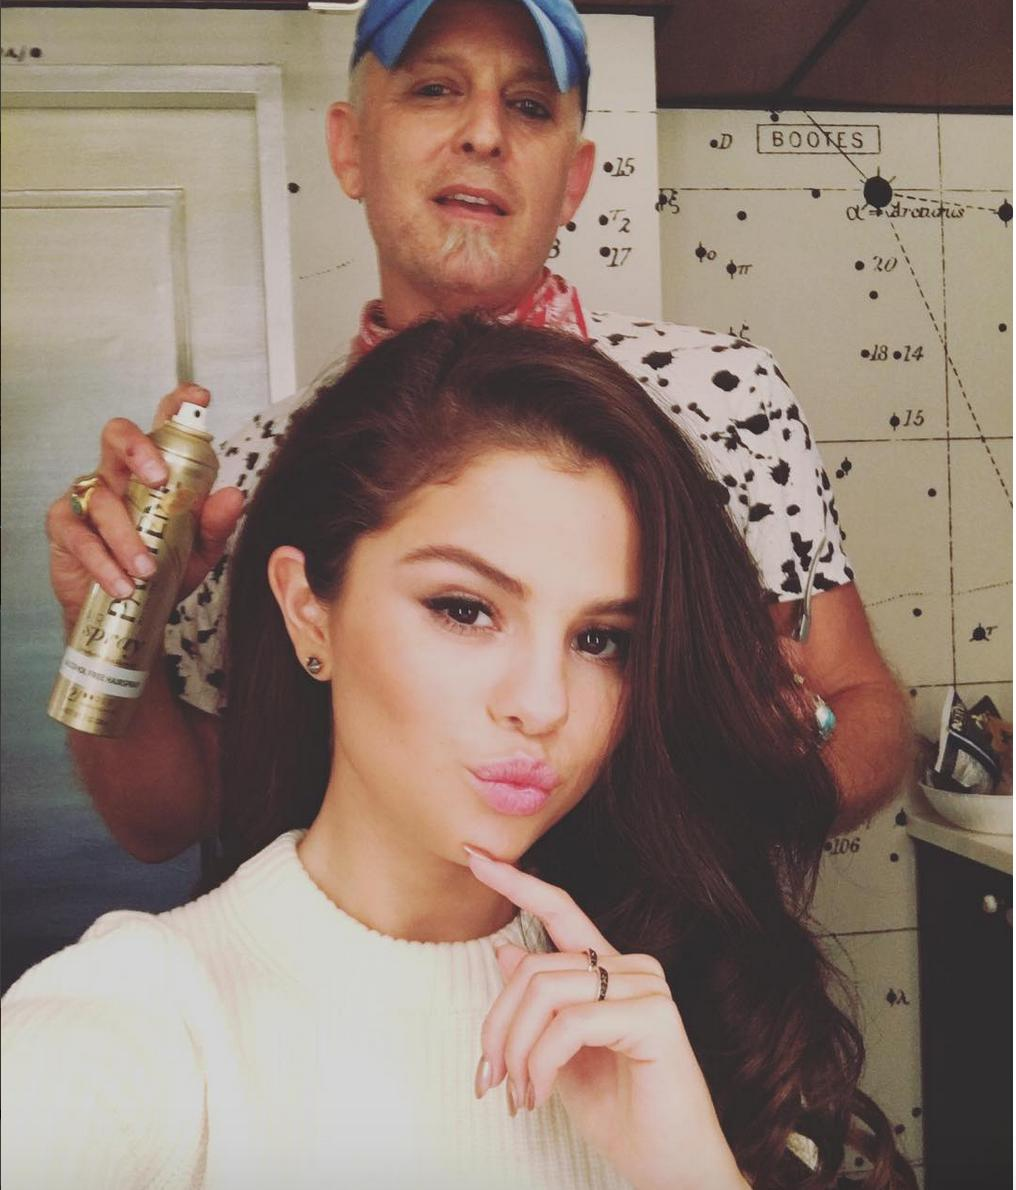 Selena Gomez getting ready